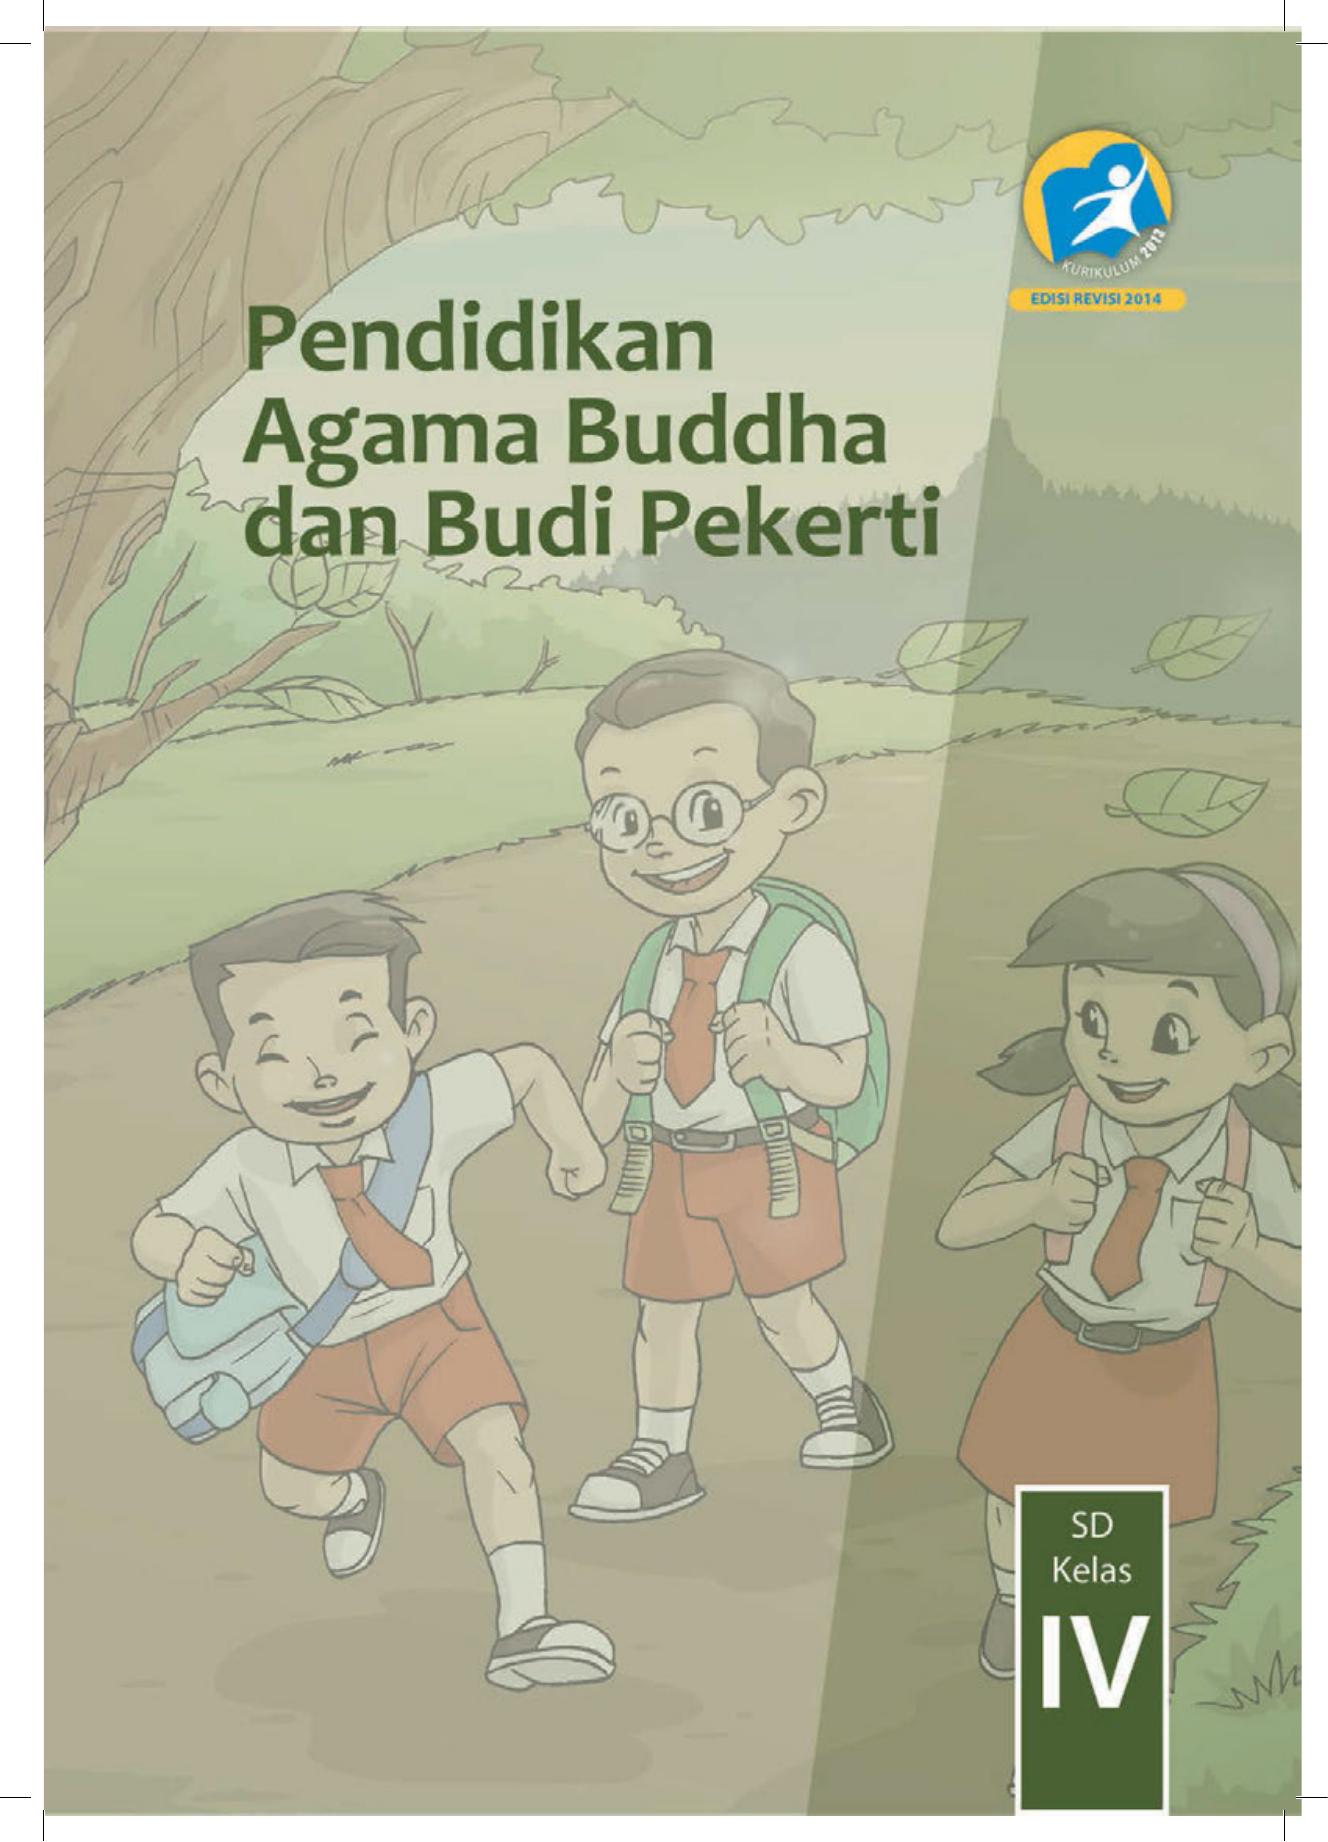 Kelas 04 SD Pendidikan Agama Buddha Dan